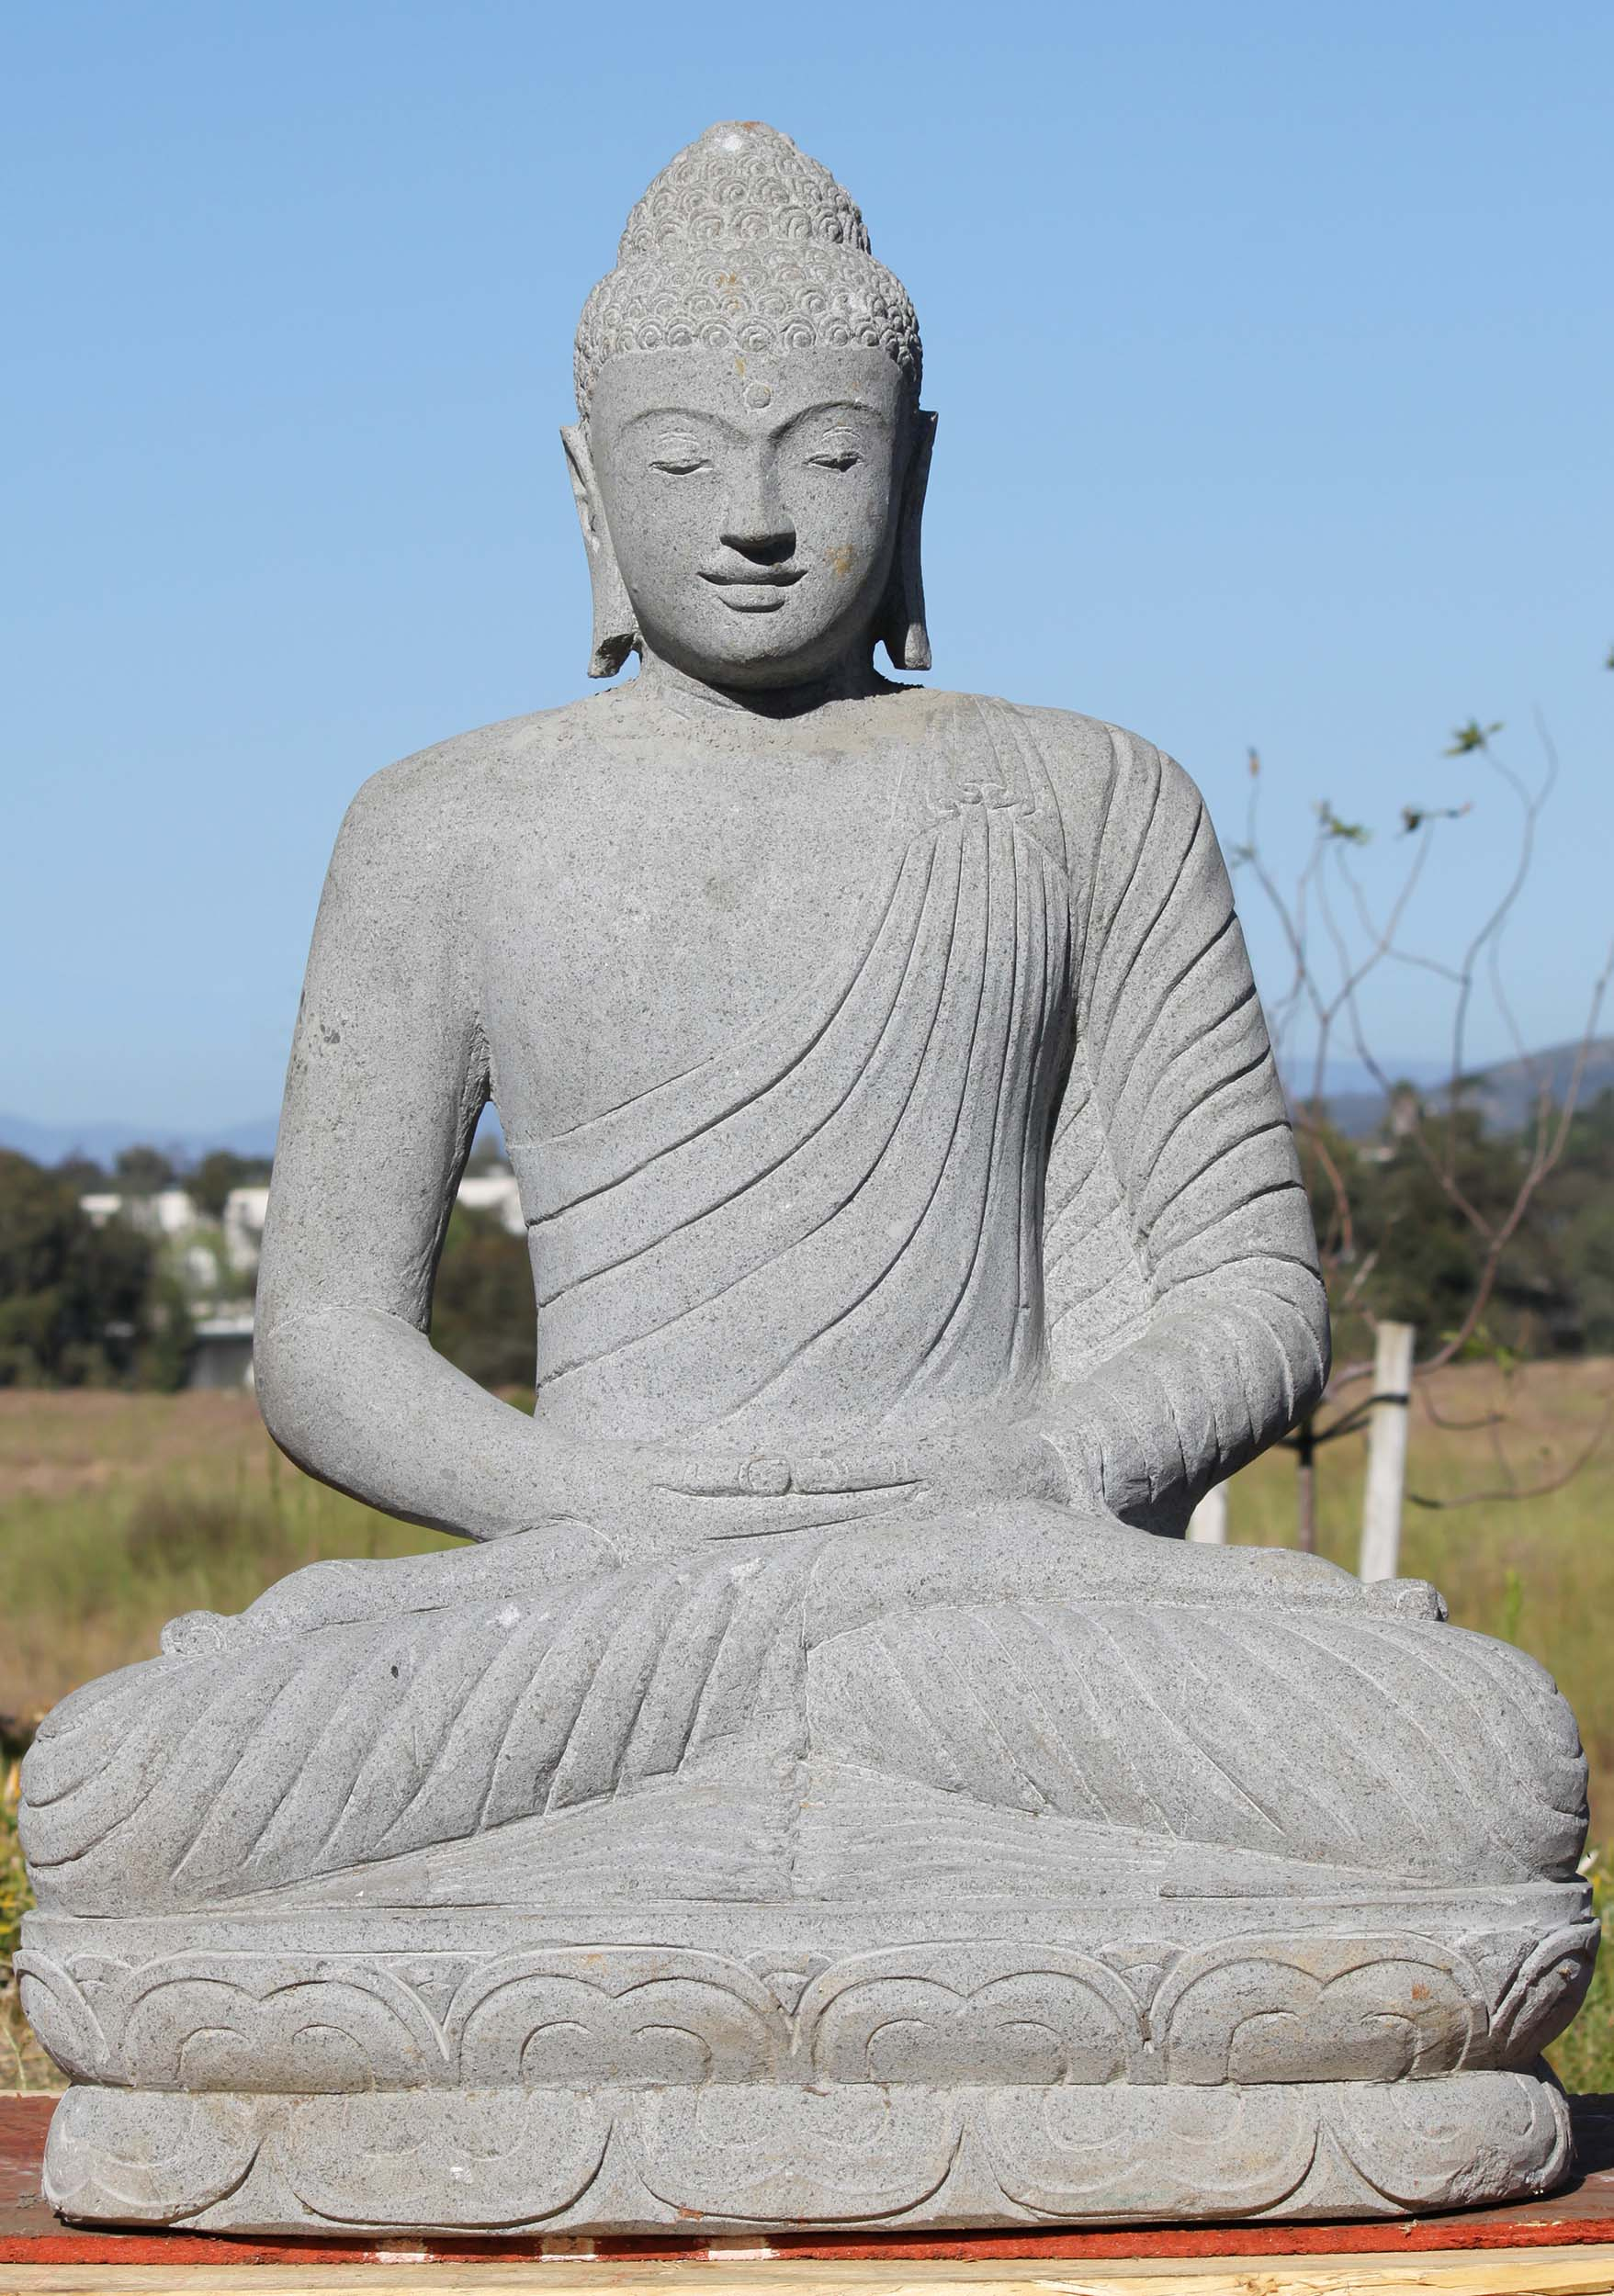 Sold stone meditating garden buddha statue 40 52ls41 for Outdoor buddha